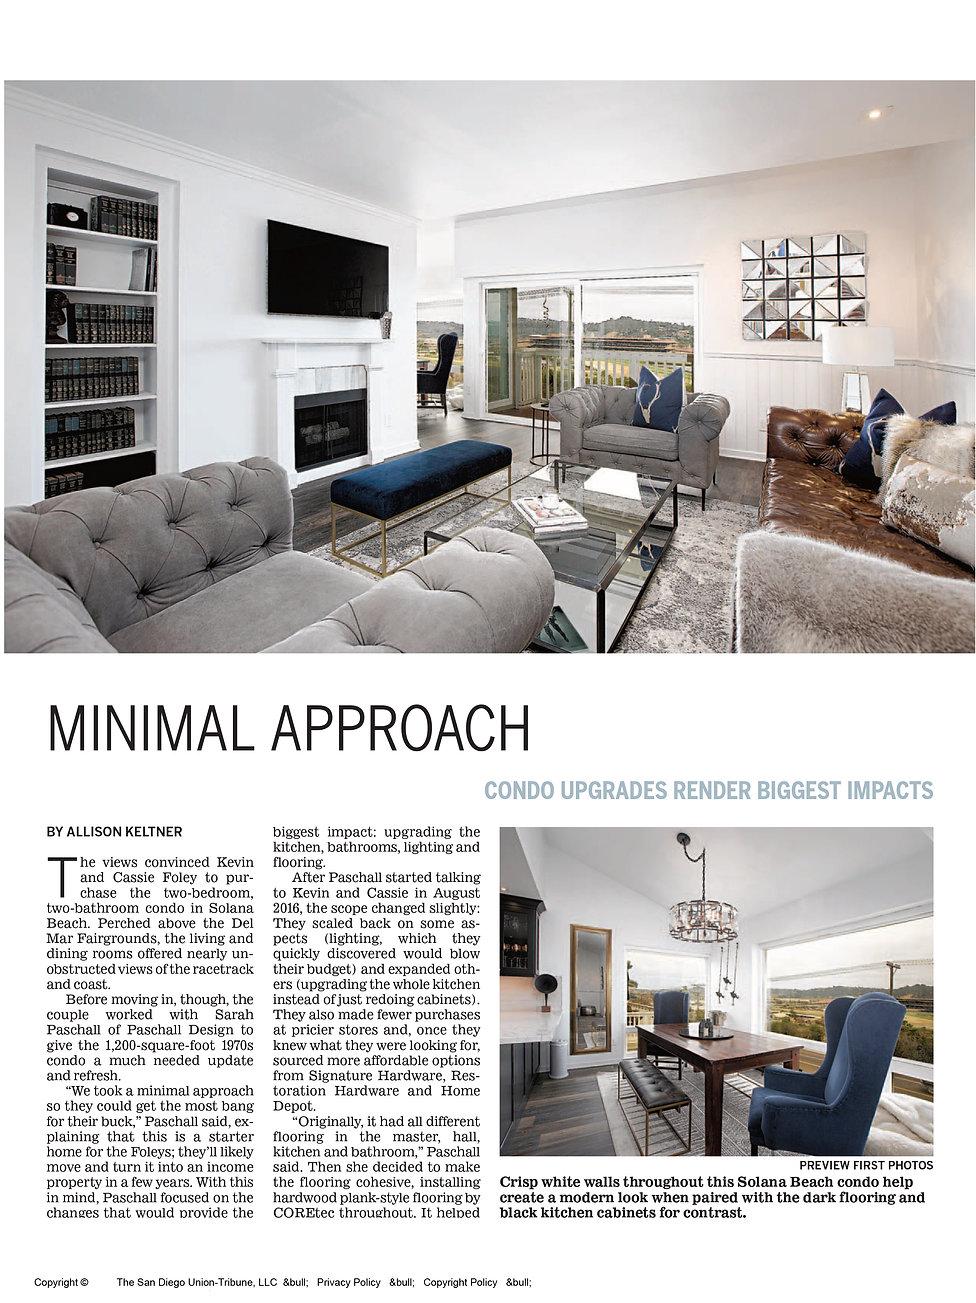 CoastalHomes Page-1.jpg